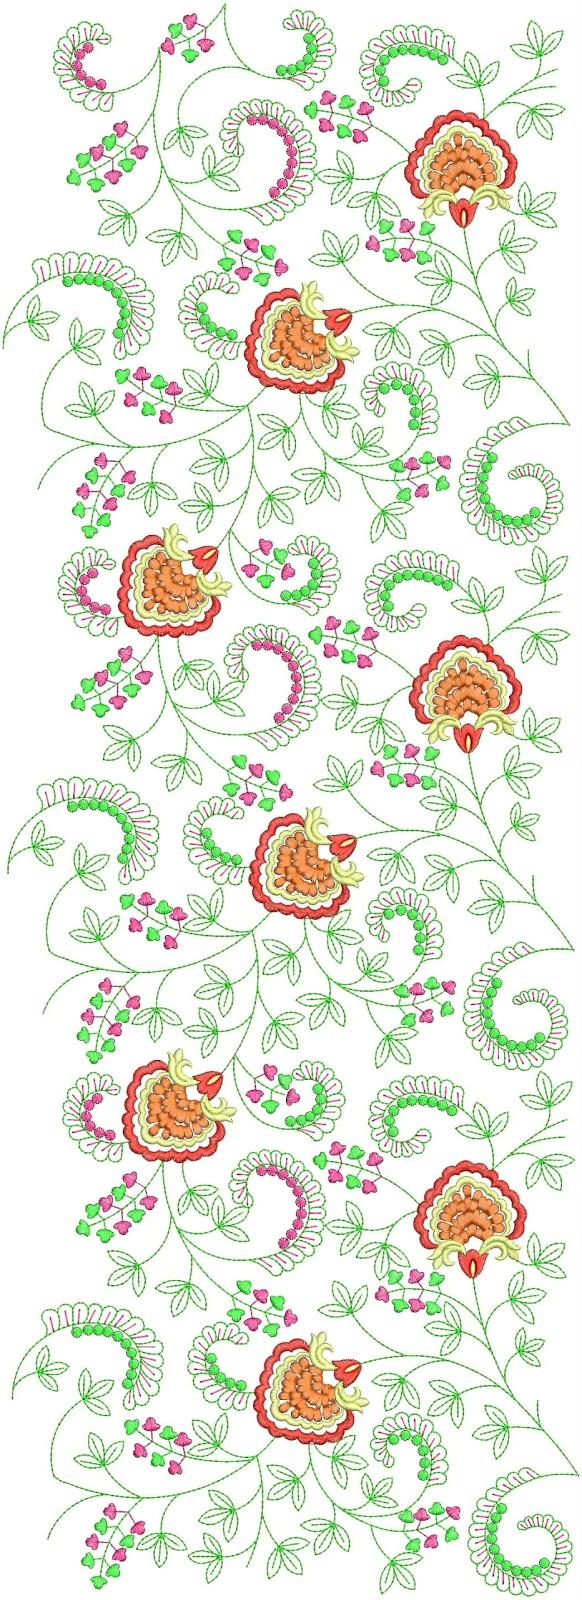 Embdesigntube modern curvy floral embroidery allover designs